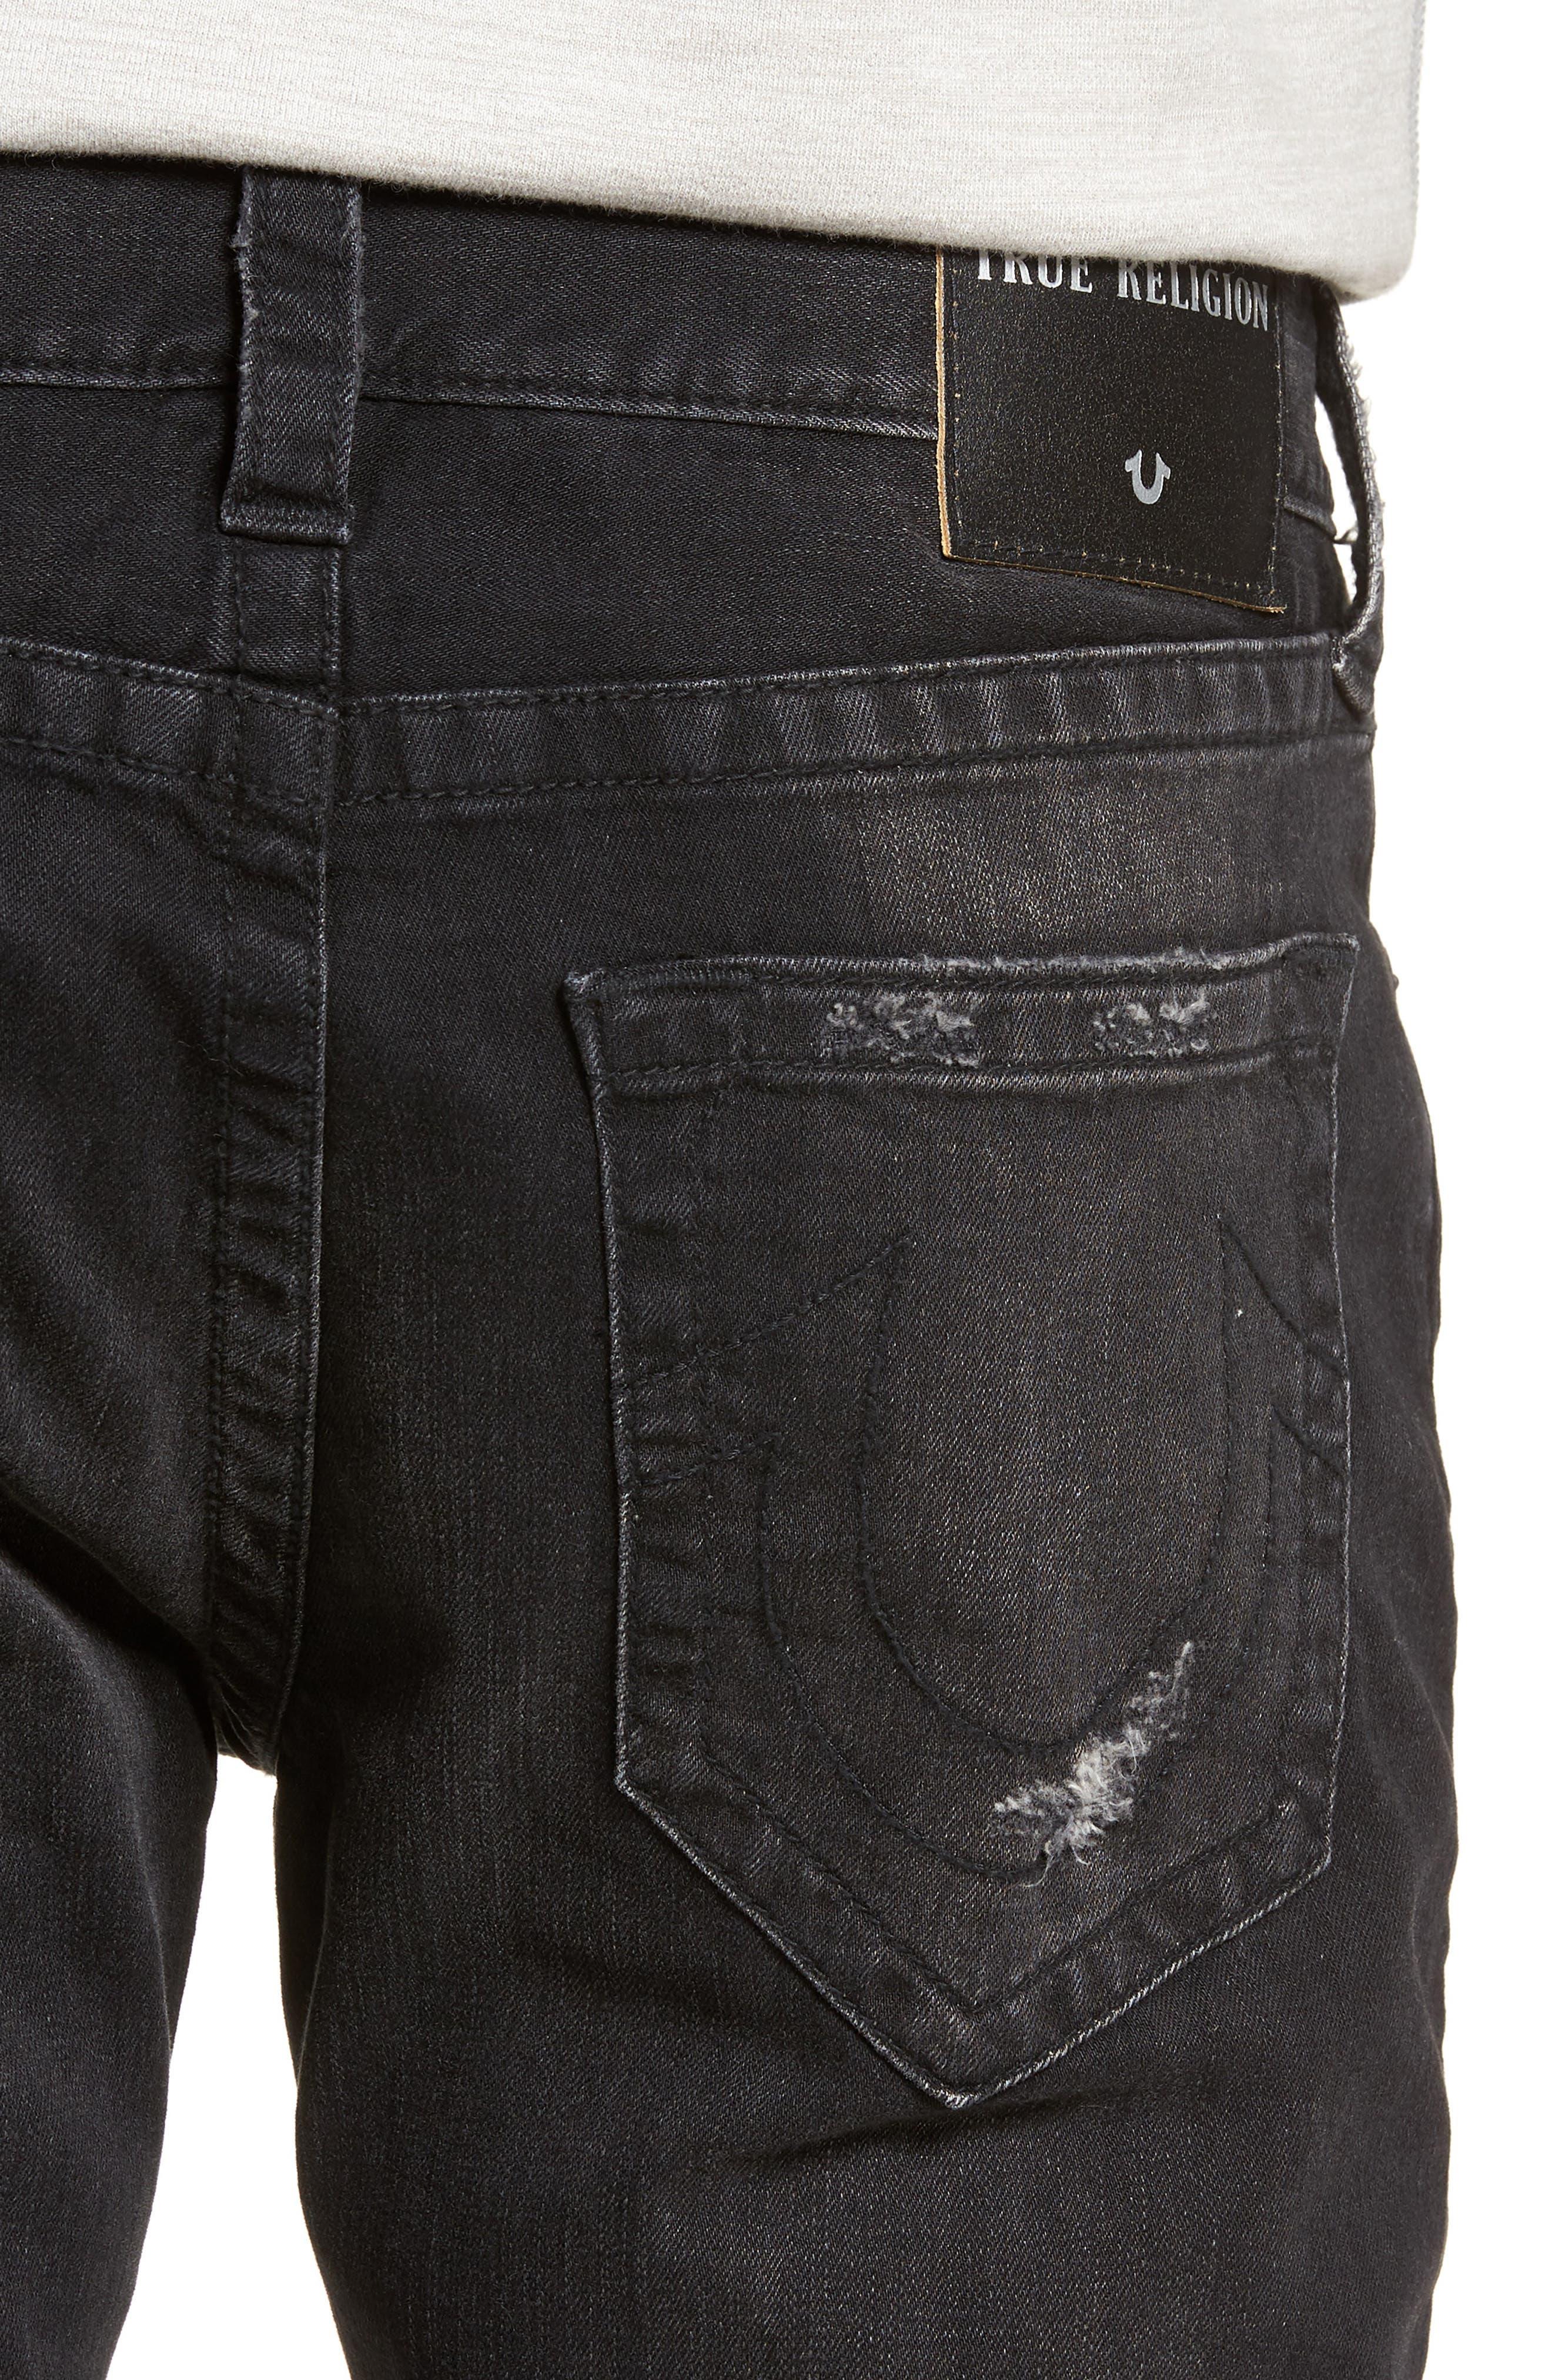 Rocco Skinny Fit Jeans,                             Alternate thumbnail 4, color,                             EQYD DARK STREET